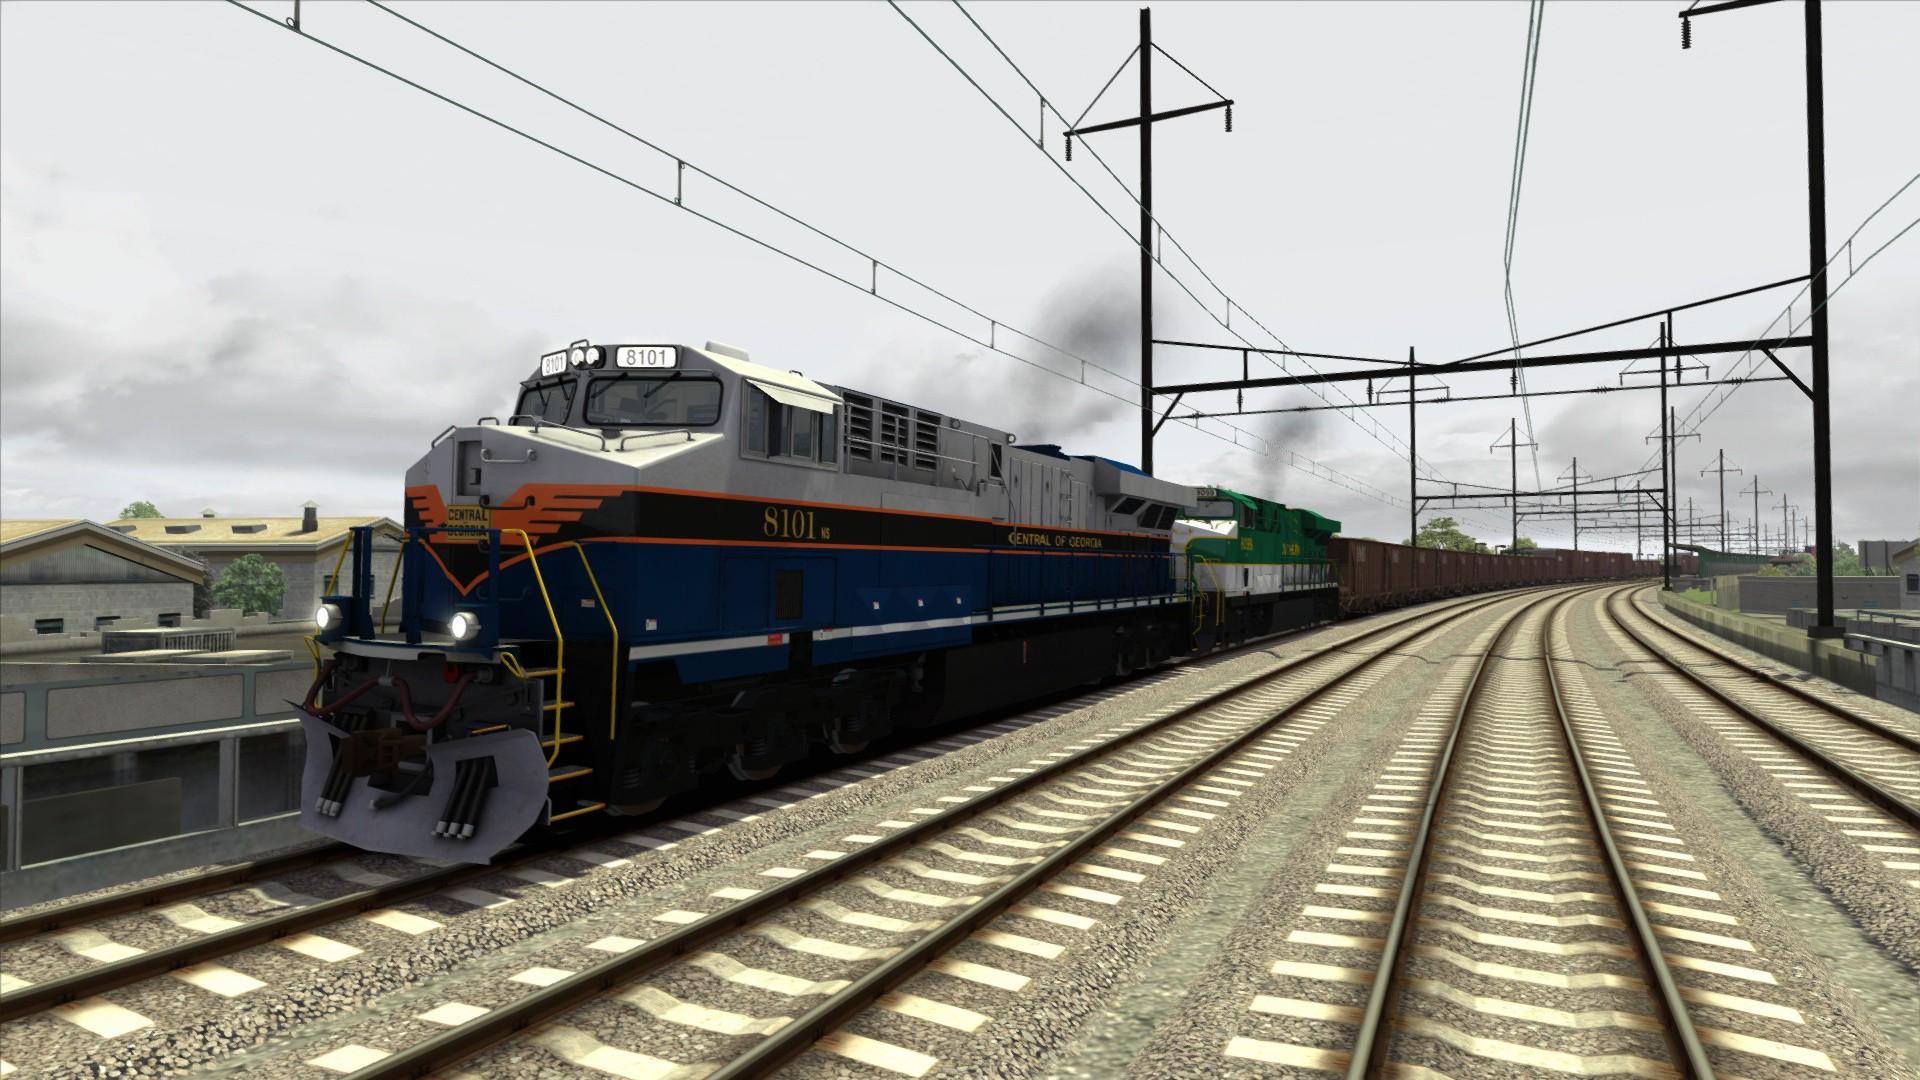 Train Simulator: Norfolk Southern Heritage ES44ACs Loco Add-On screenshot